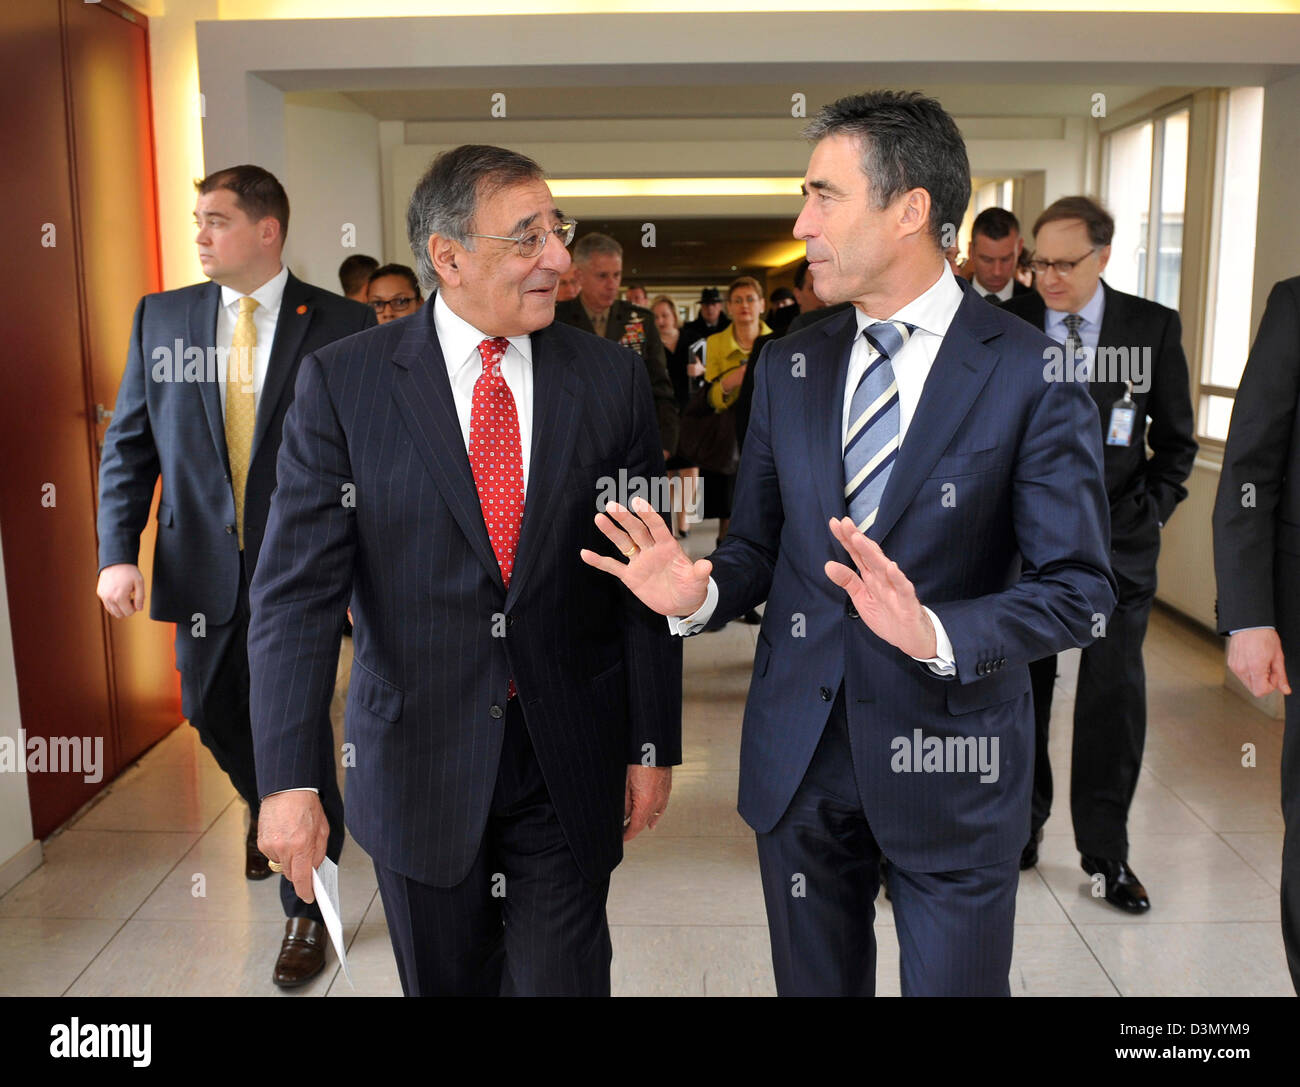 US Secretary of Defense Leon Panetta walks to lunch with NATO Secretary General Anders Fogh Rasmussen at NATO Headquarters Stock Photo